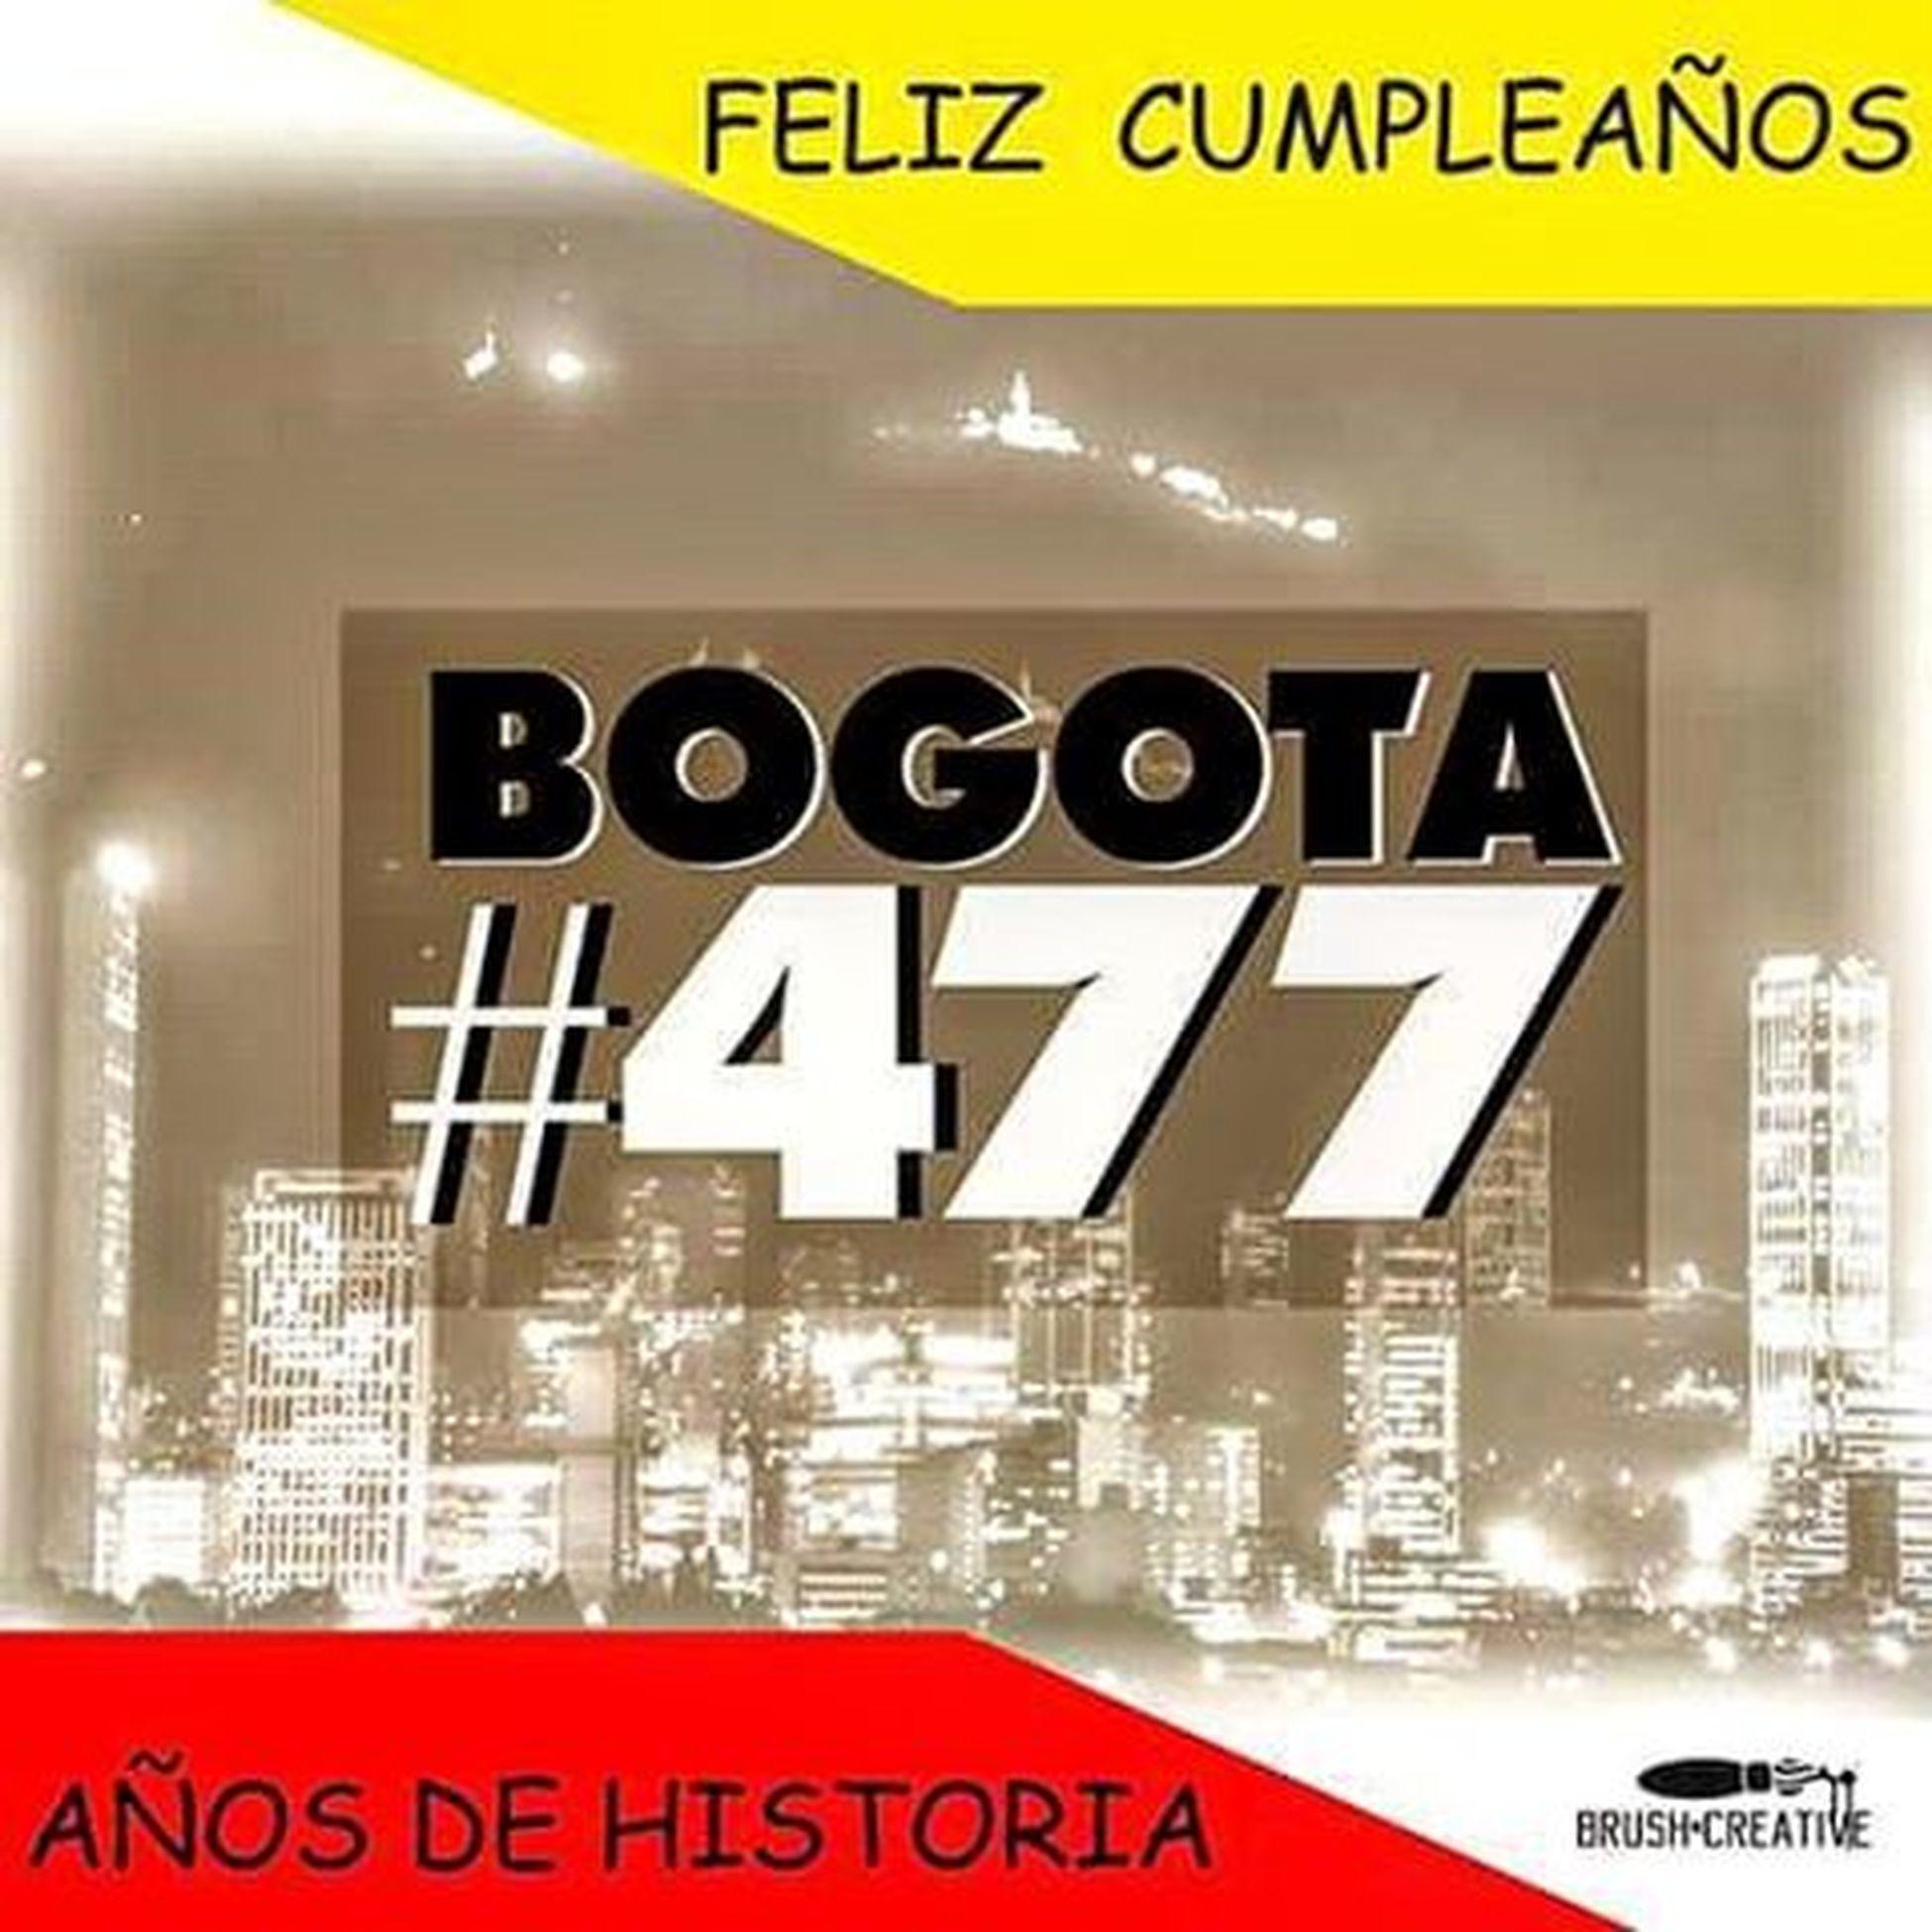 Feliz cumpleaños Bogotá 477 👏🏢🏨🏥⛪🙌🎇🎉🎆🌆🌃 Design by @brushcreative Santafedebogota City Art Picture HappyBirthday History Legendary óleo Creative Music Culture Rolo Cachaco Bogotano Talent Filters Years Graphic Live Yellow Red Sepia